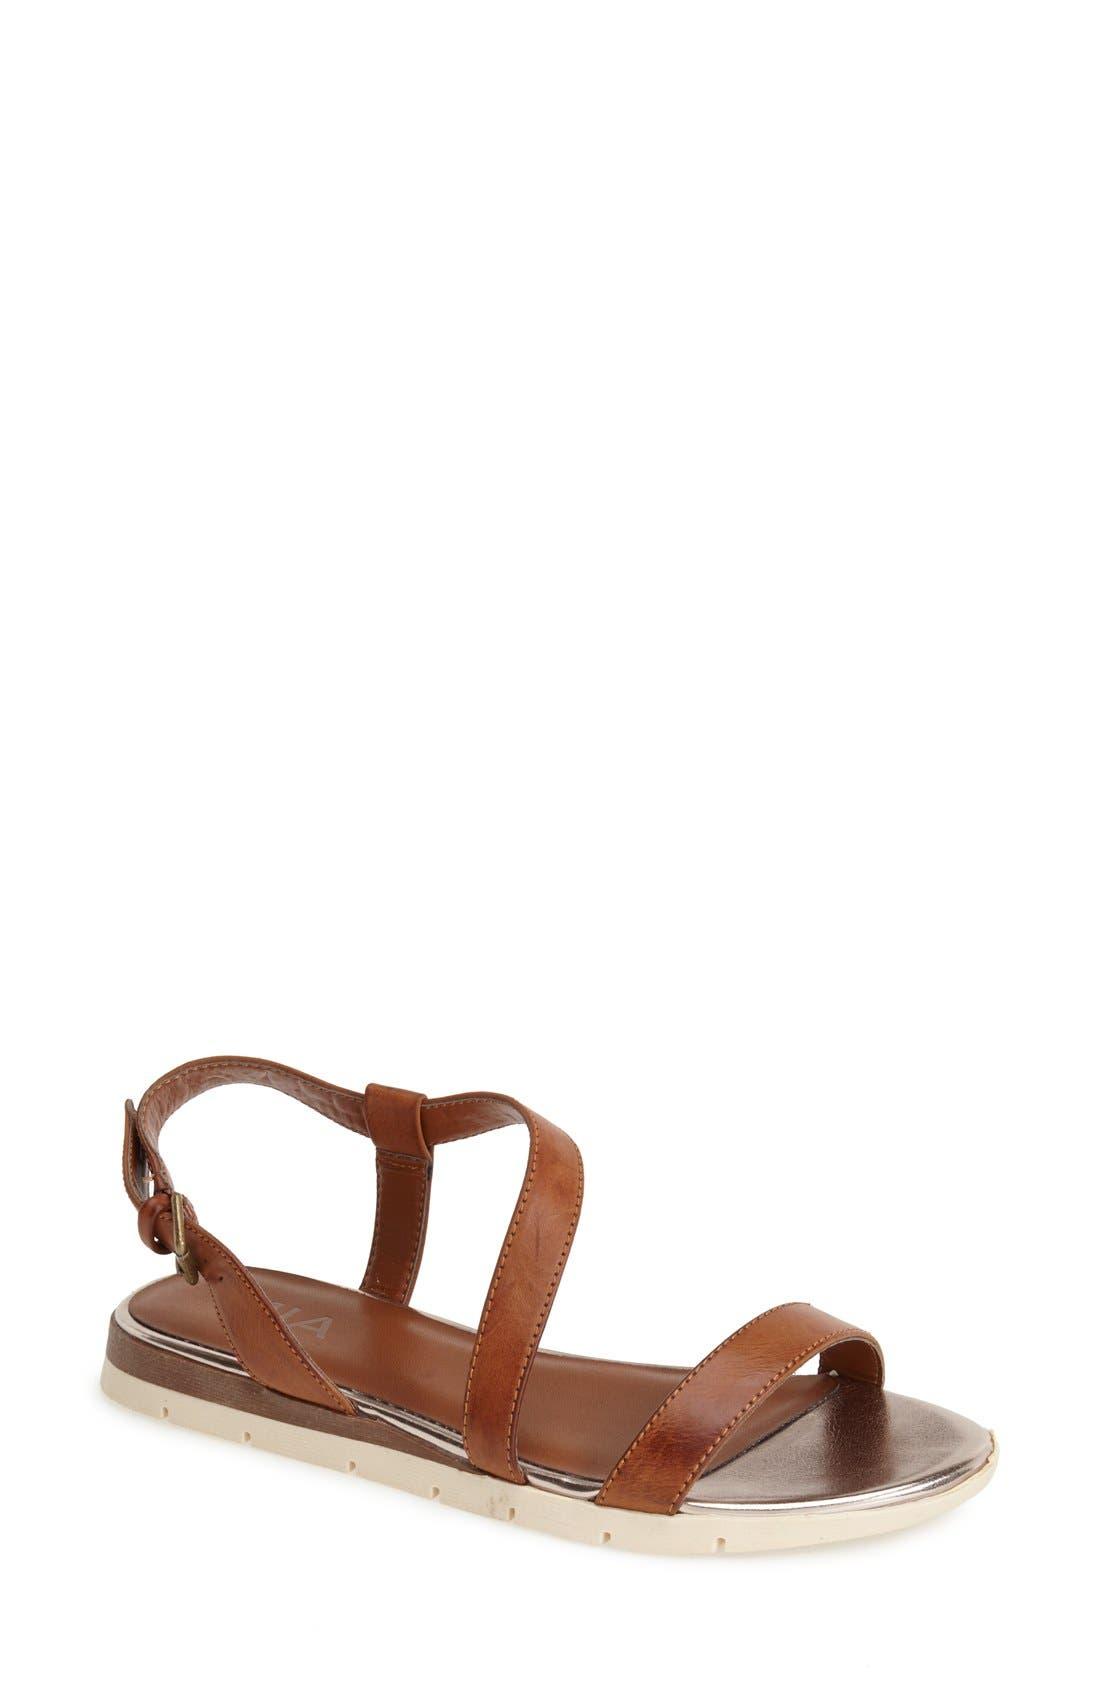 Alternate Image 1 Selected - MIA 'Baseline' Slingback Flat Sandal (Women)